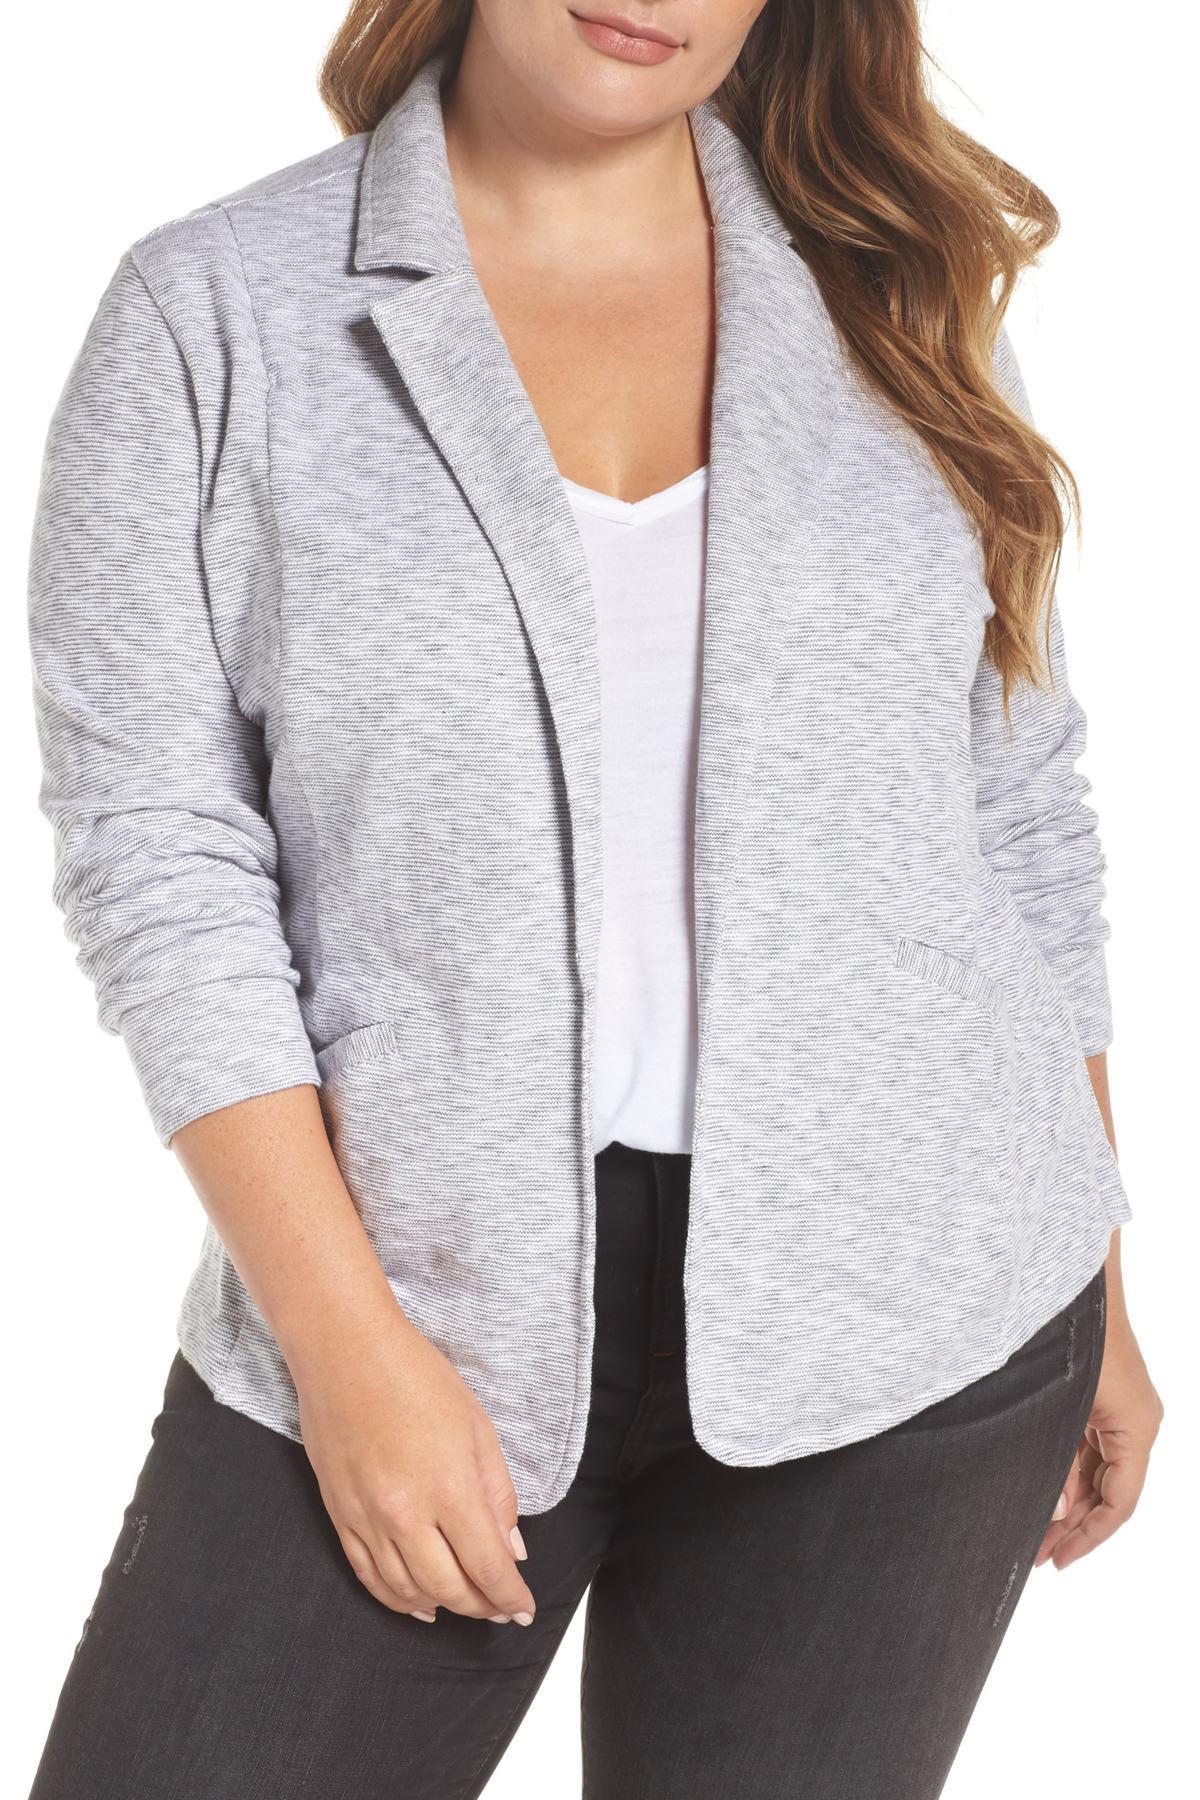 1690f5cc99b2d Lyst - Caslon (r) Knit Blazer (plus Size) in White